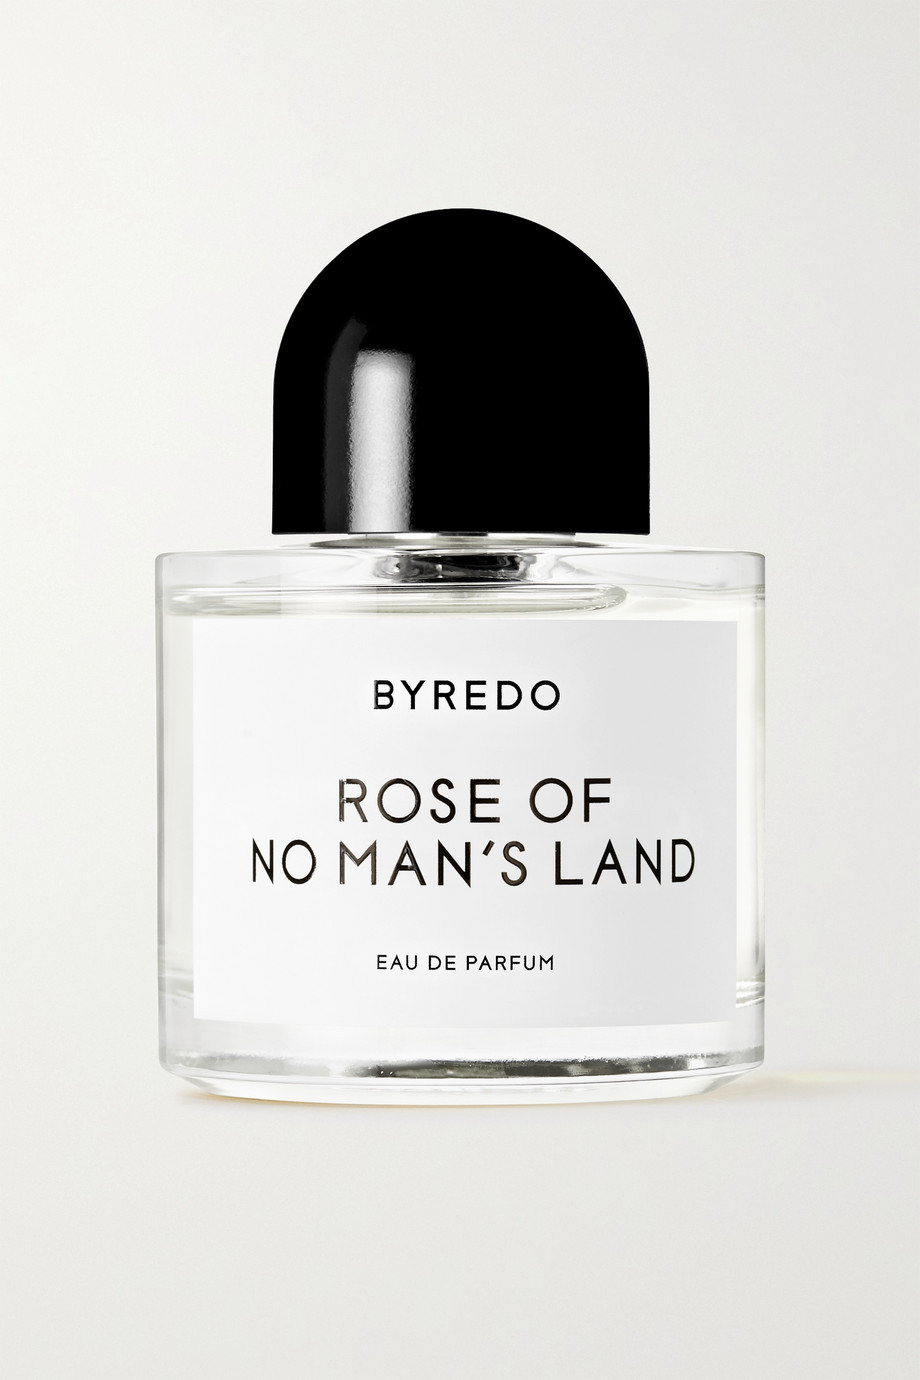 Byredo Eau de Parfum - Rose of No Man's Land, 50ml